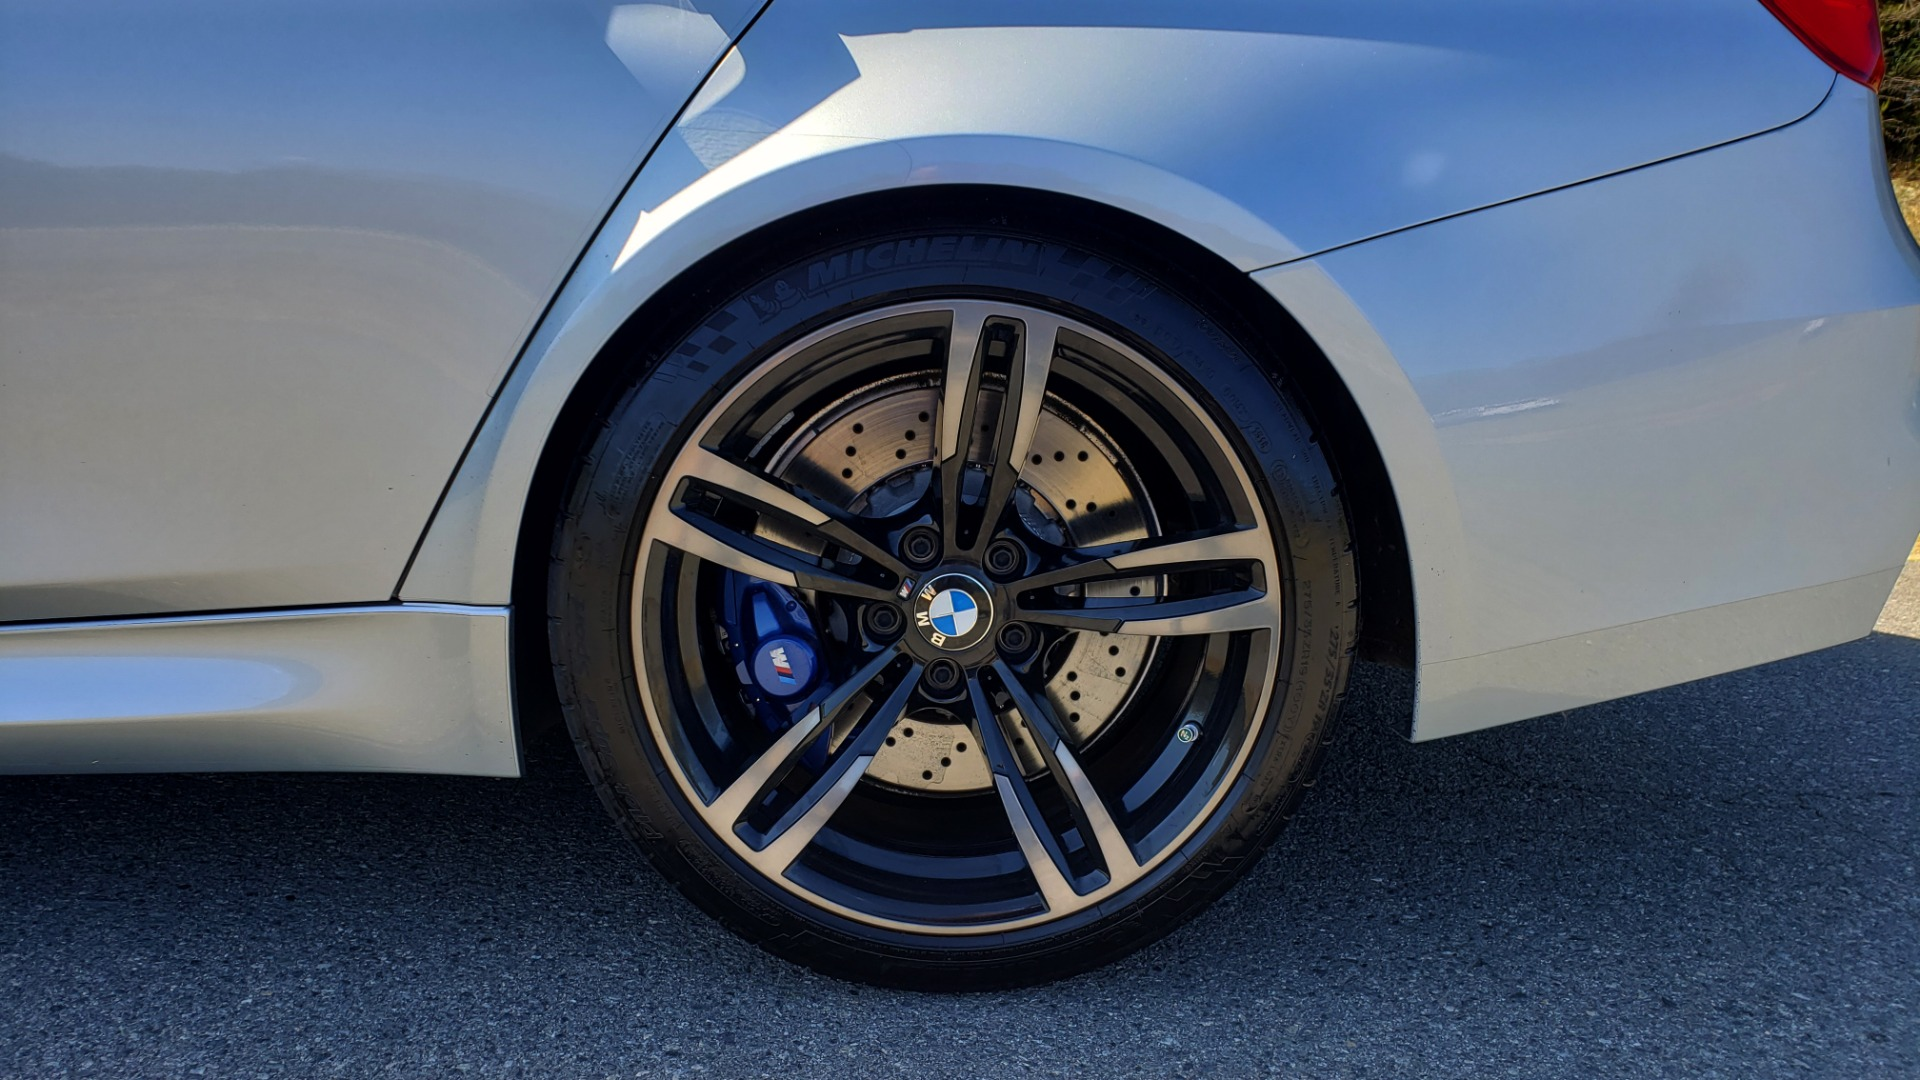 Used 2015 BMW M3 EXECUTIVE PKG / NAV / CAMERA / HUD / CARBON FIBER ROOF for sale Sold at Formula Imports in Charlotte NC 28227 92